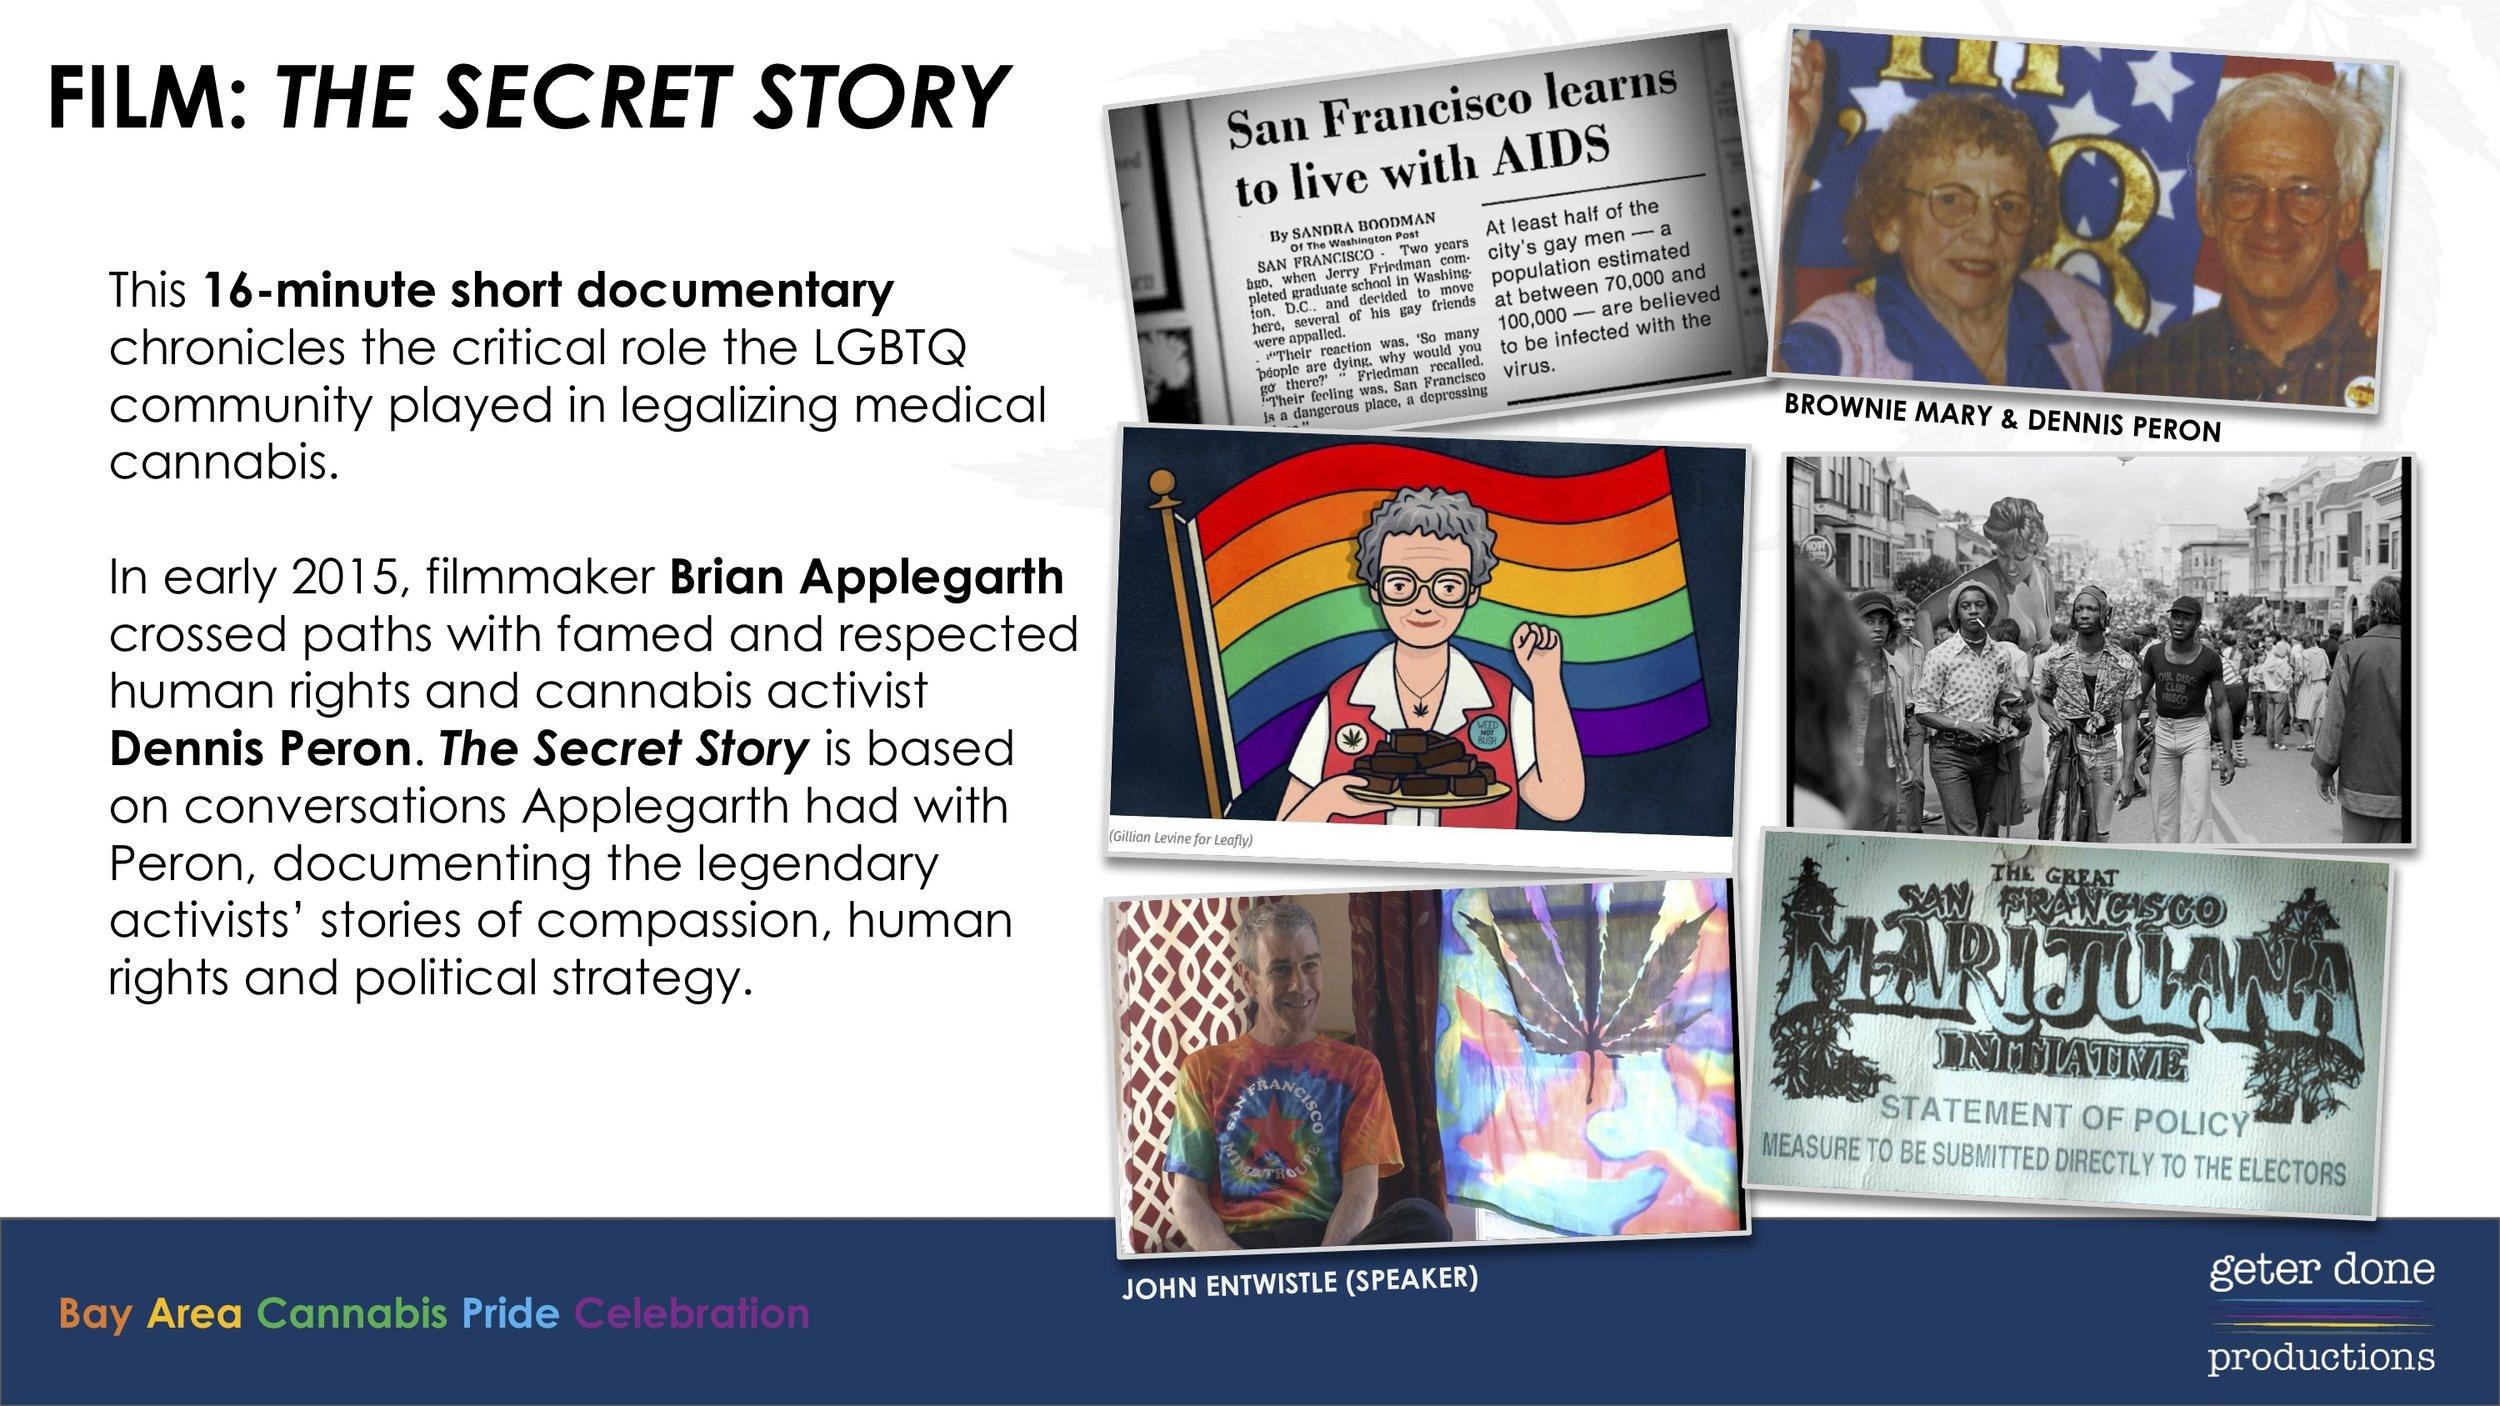 BACPC-The Secret Story.jpg